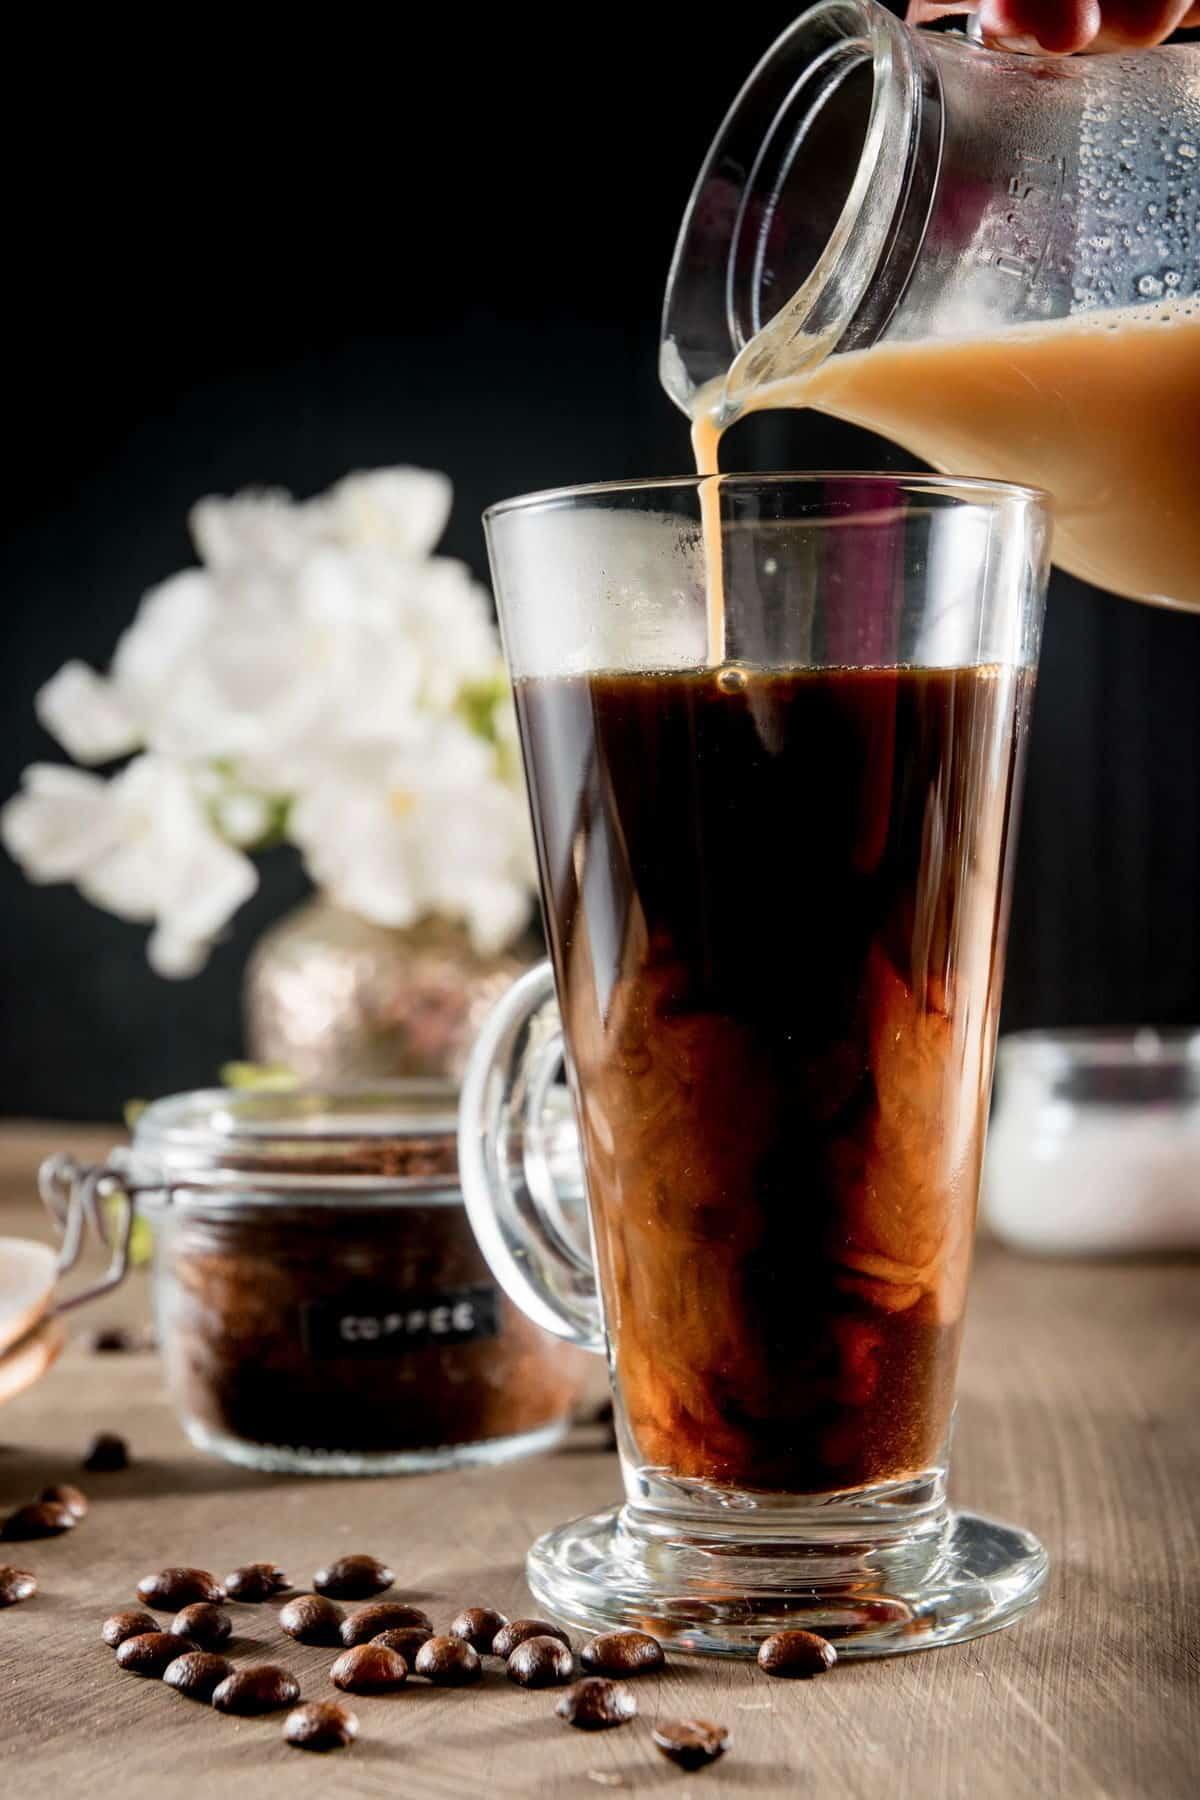 Coffee in a mug with a pumpkin milk mixture.